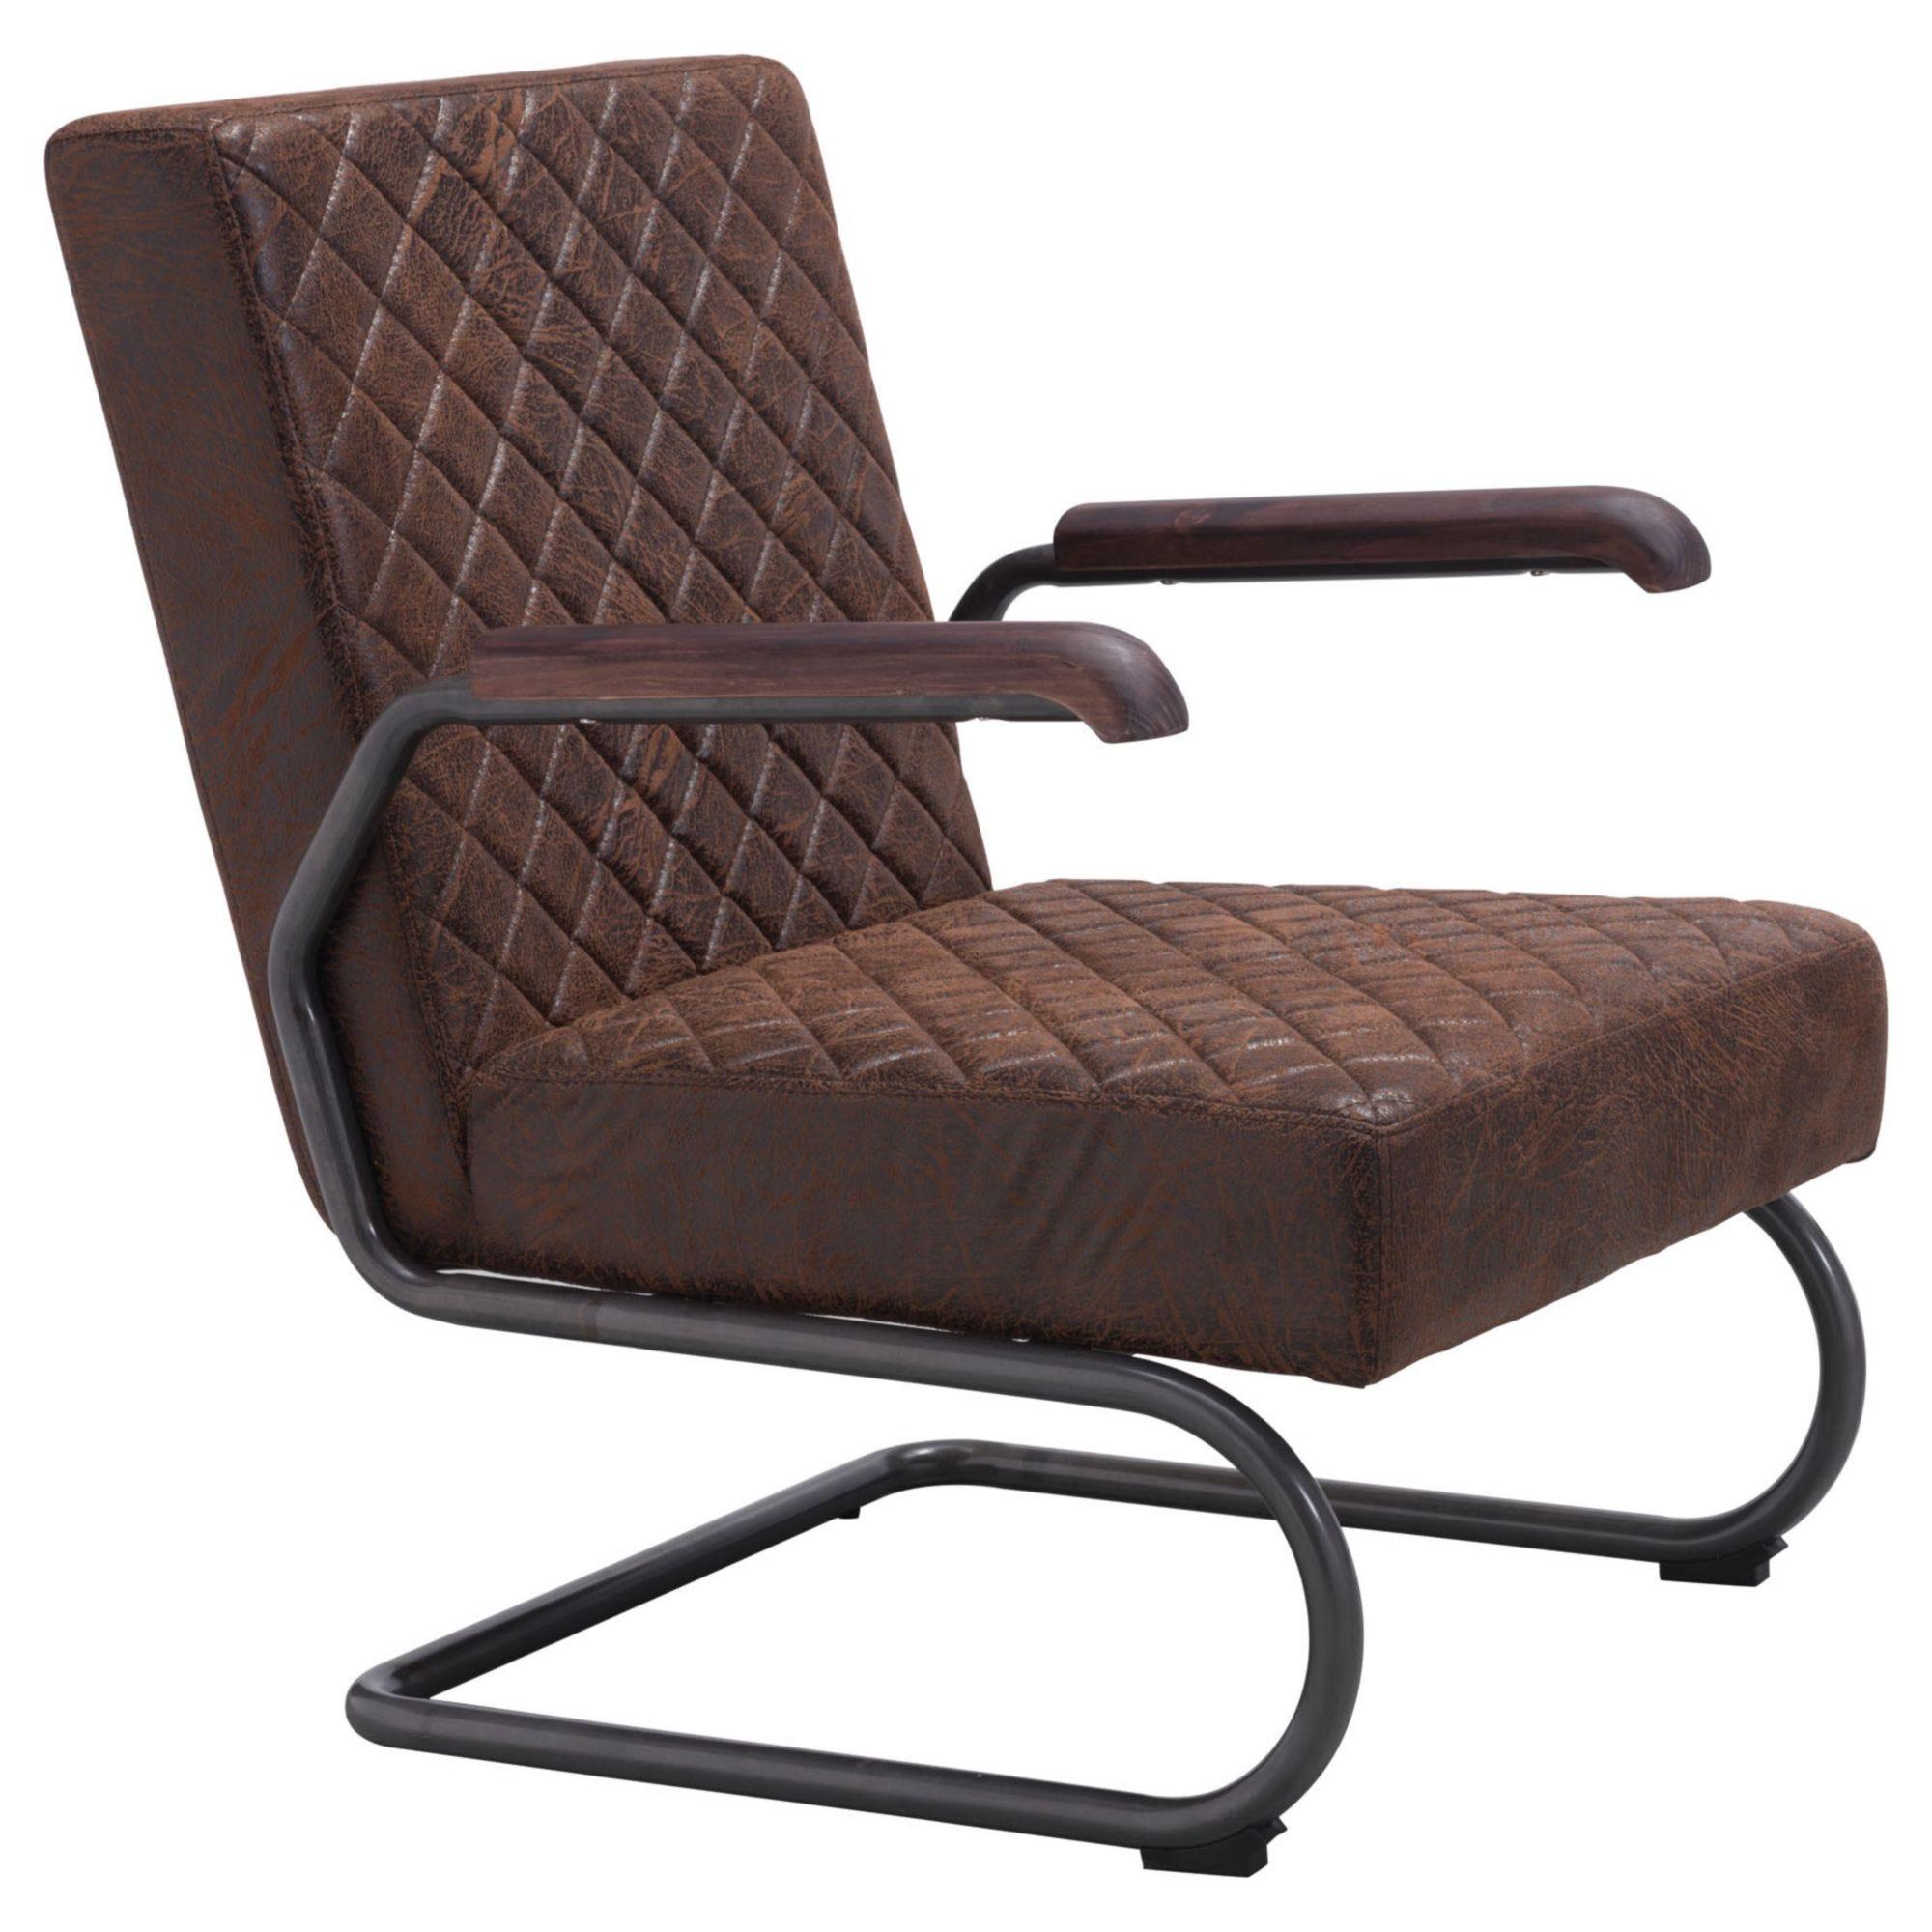 Chair And Ottoman US Mattress